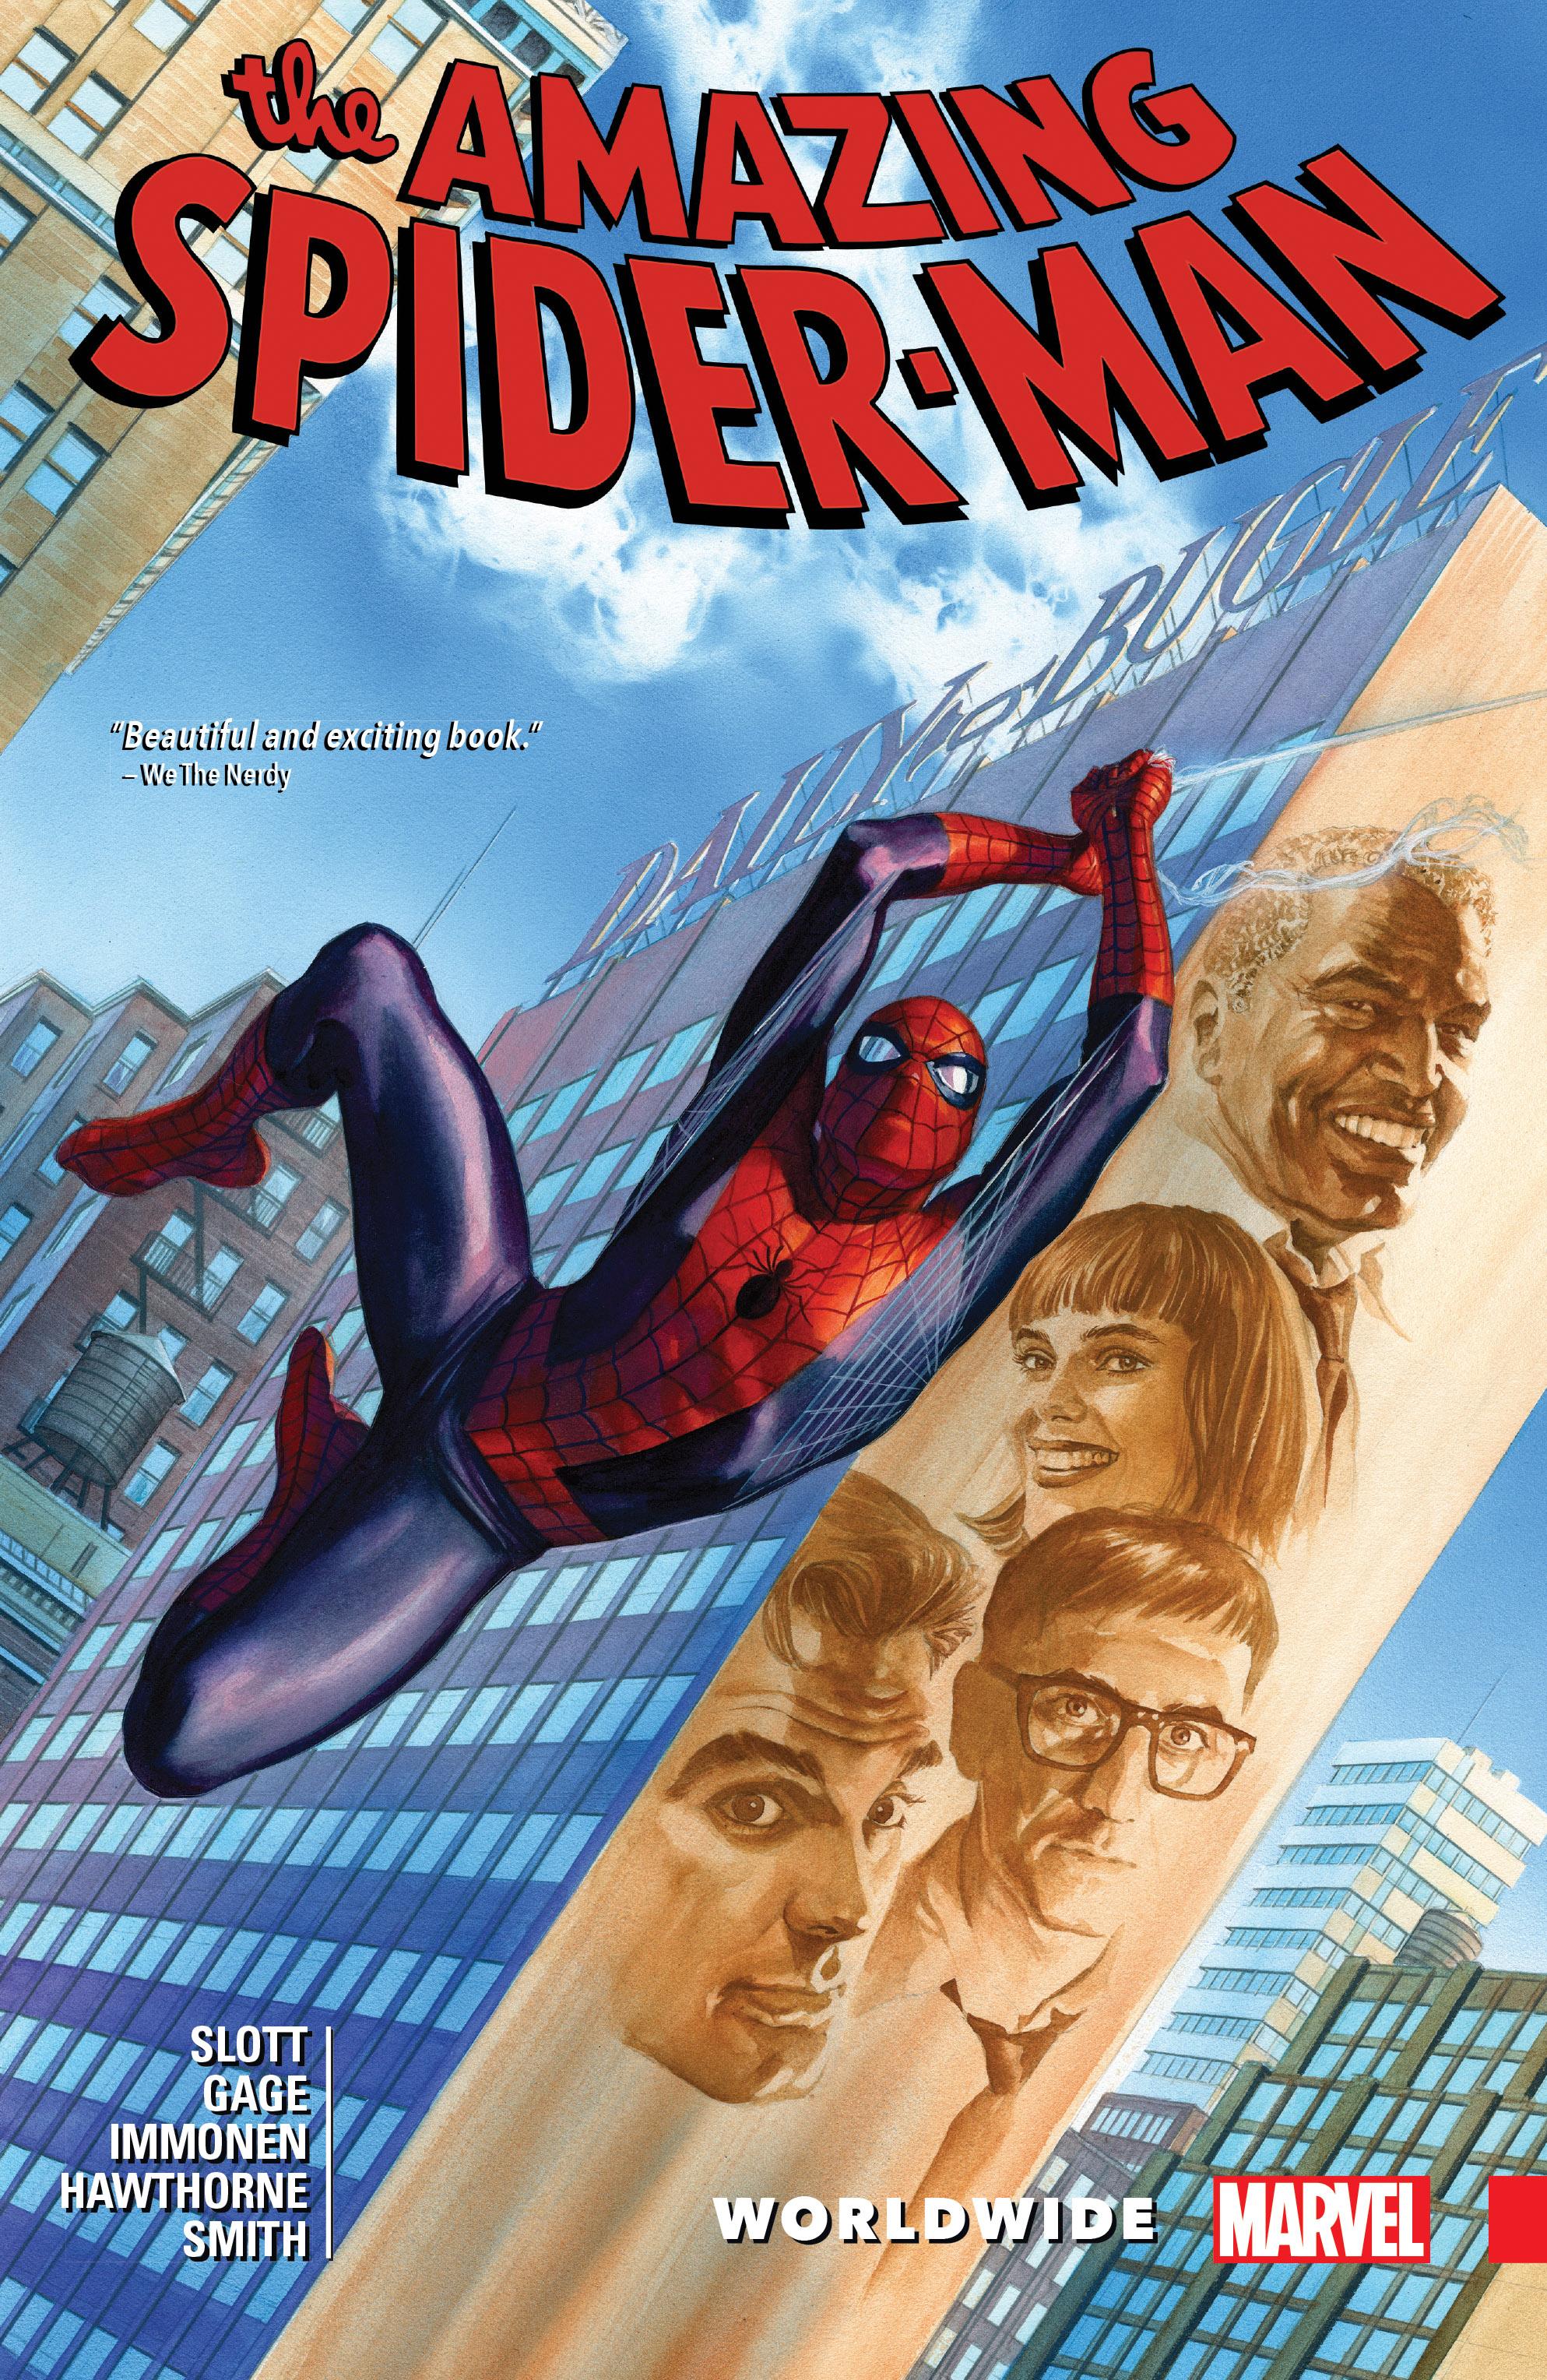 Amazing-Spider-Man: Worldwide Vol. 8 (Trade Paperback)